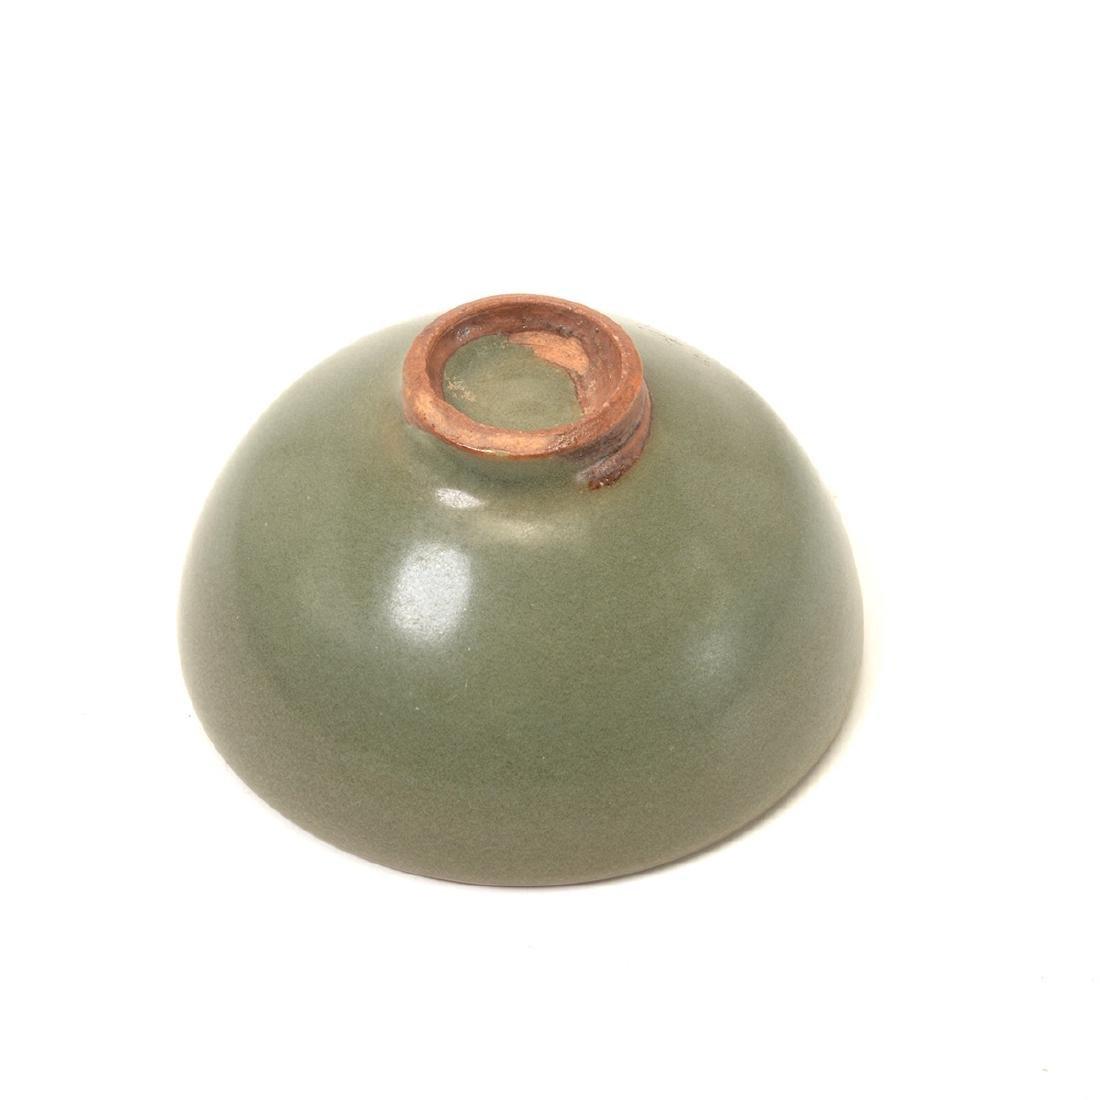 Small Jun Type Celadon Glazed Tea Bowl, Song - 3